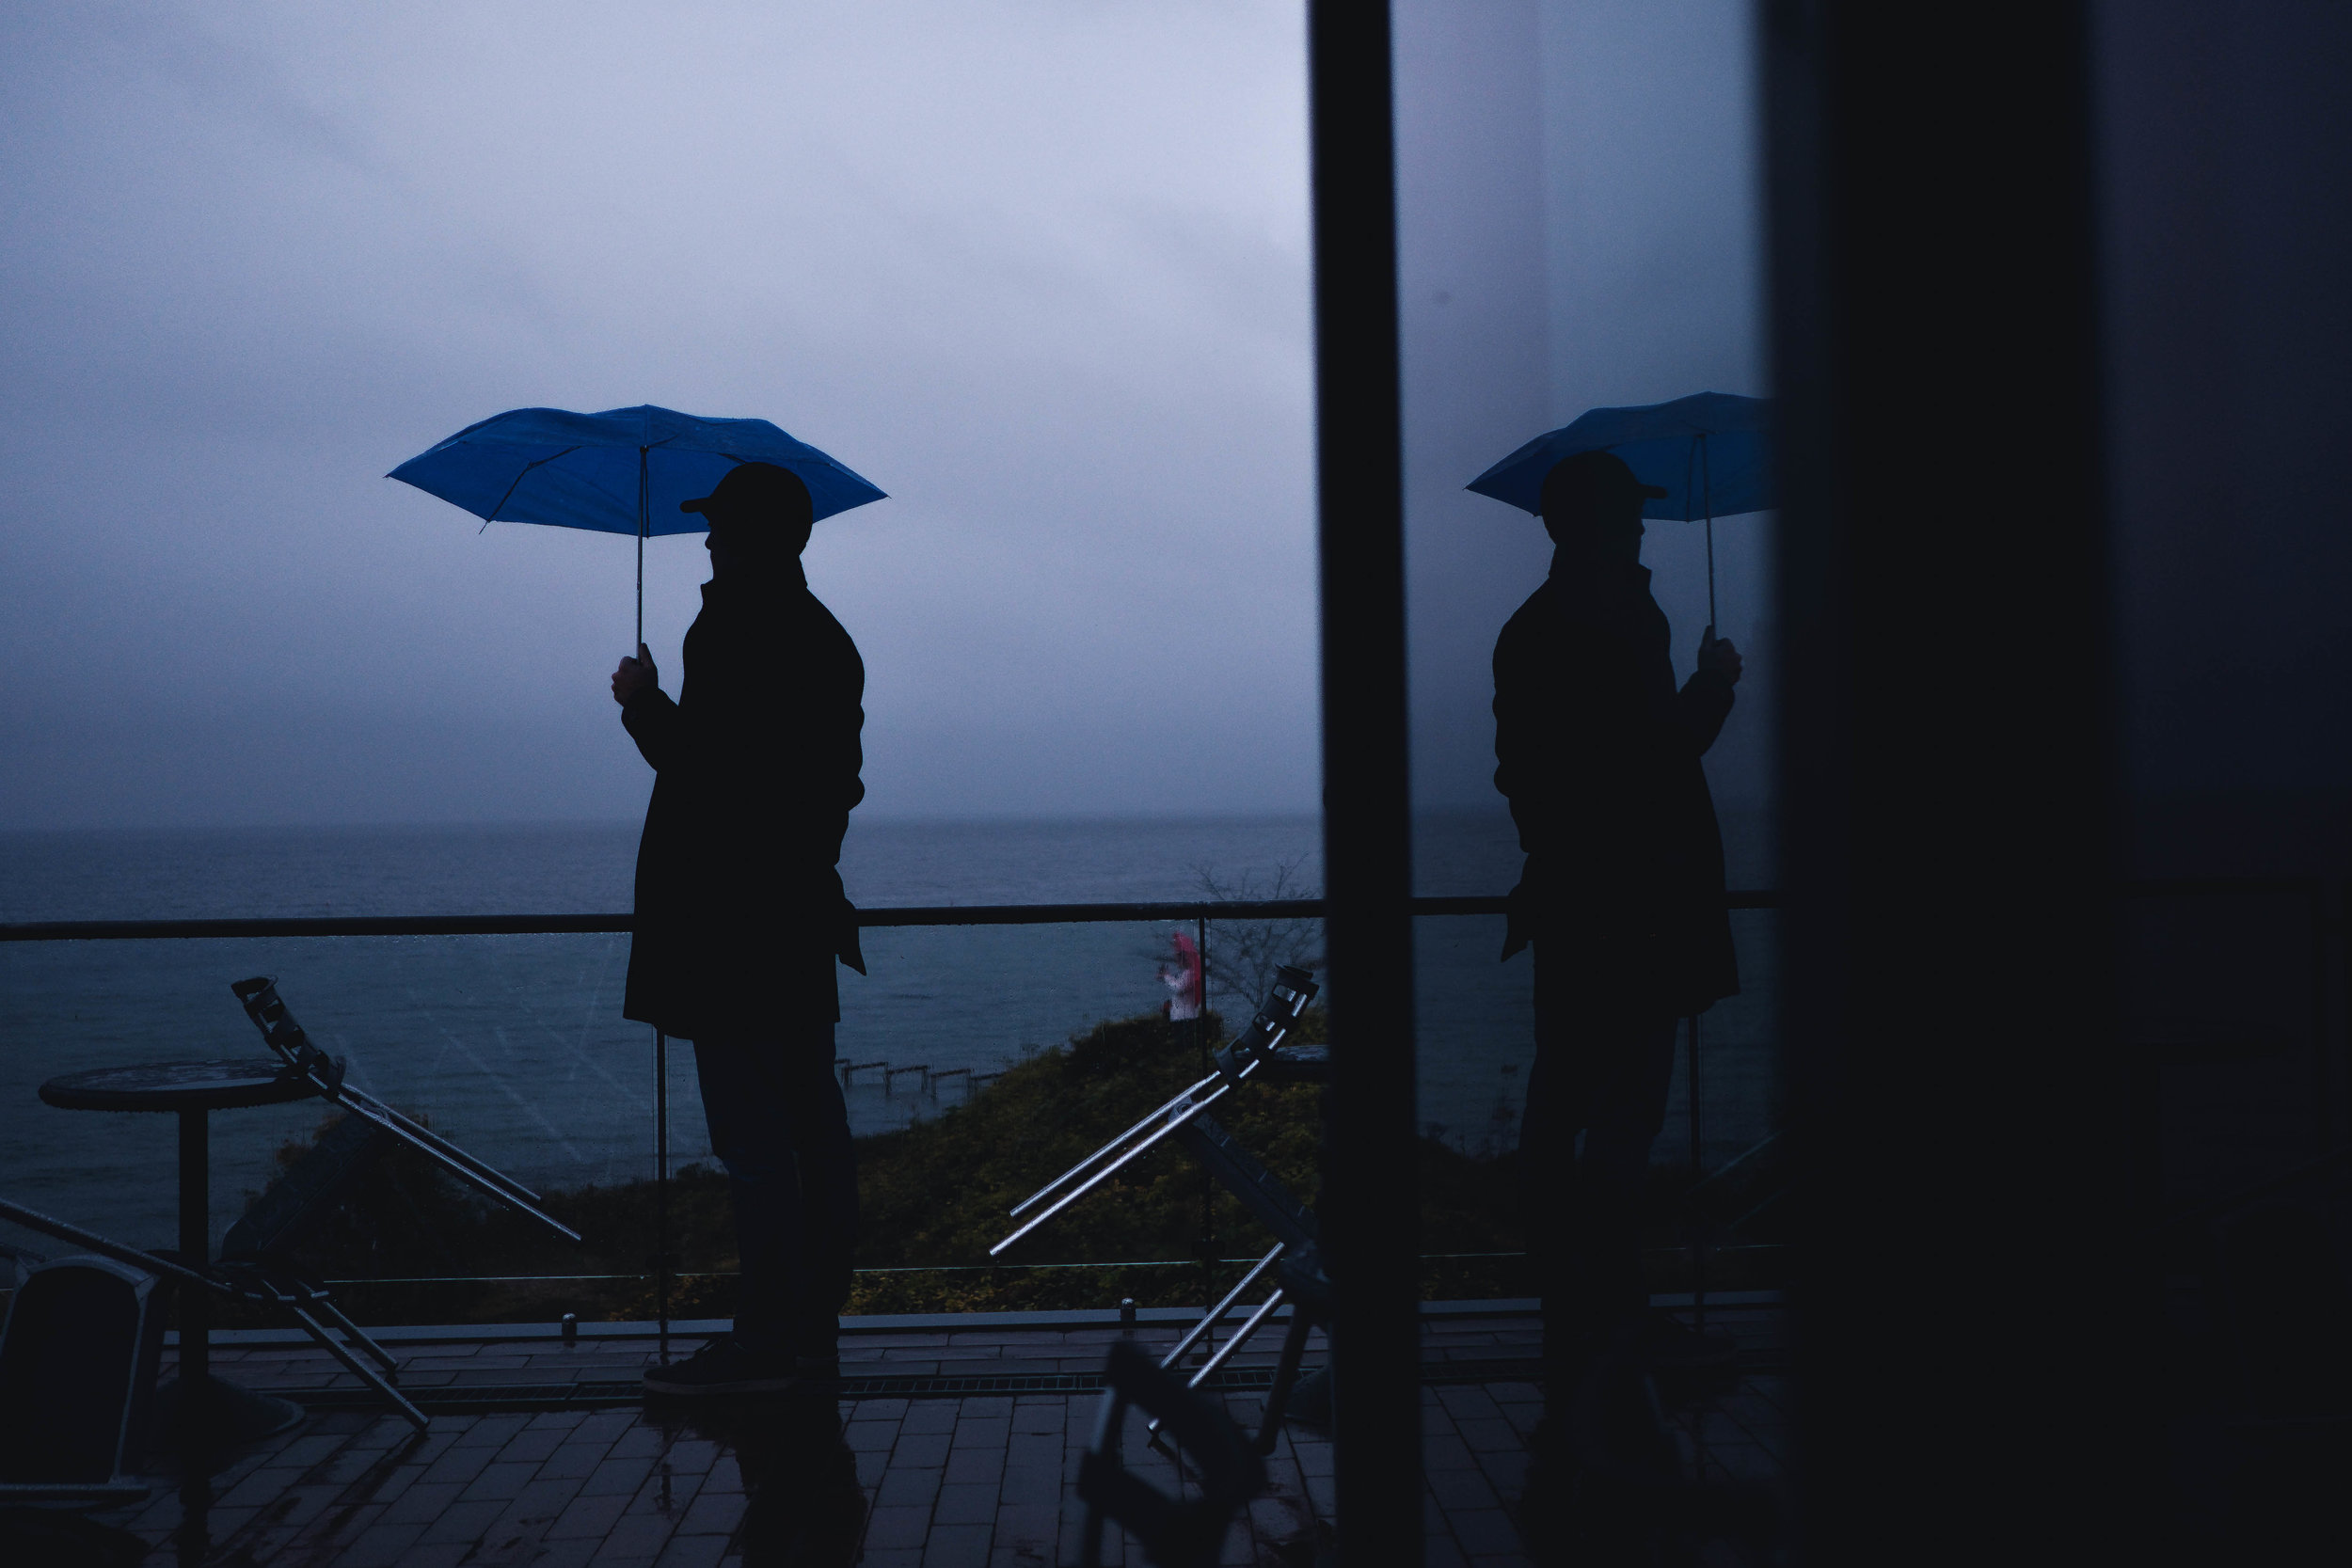 WE ALL FEEL BLUE 2017 - FUJIFILM XPRO 2